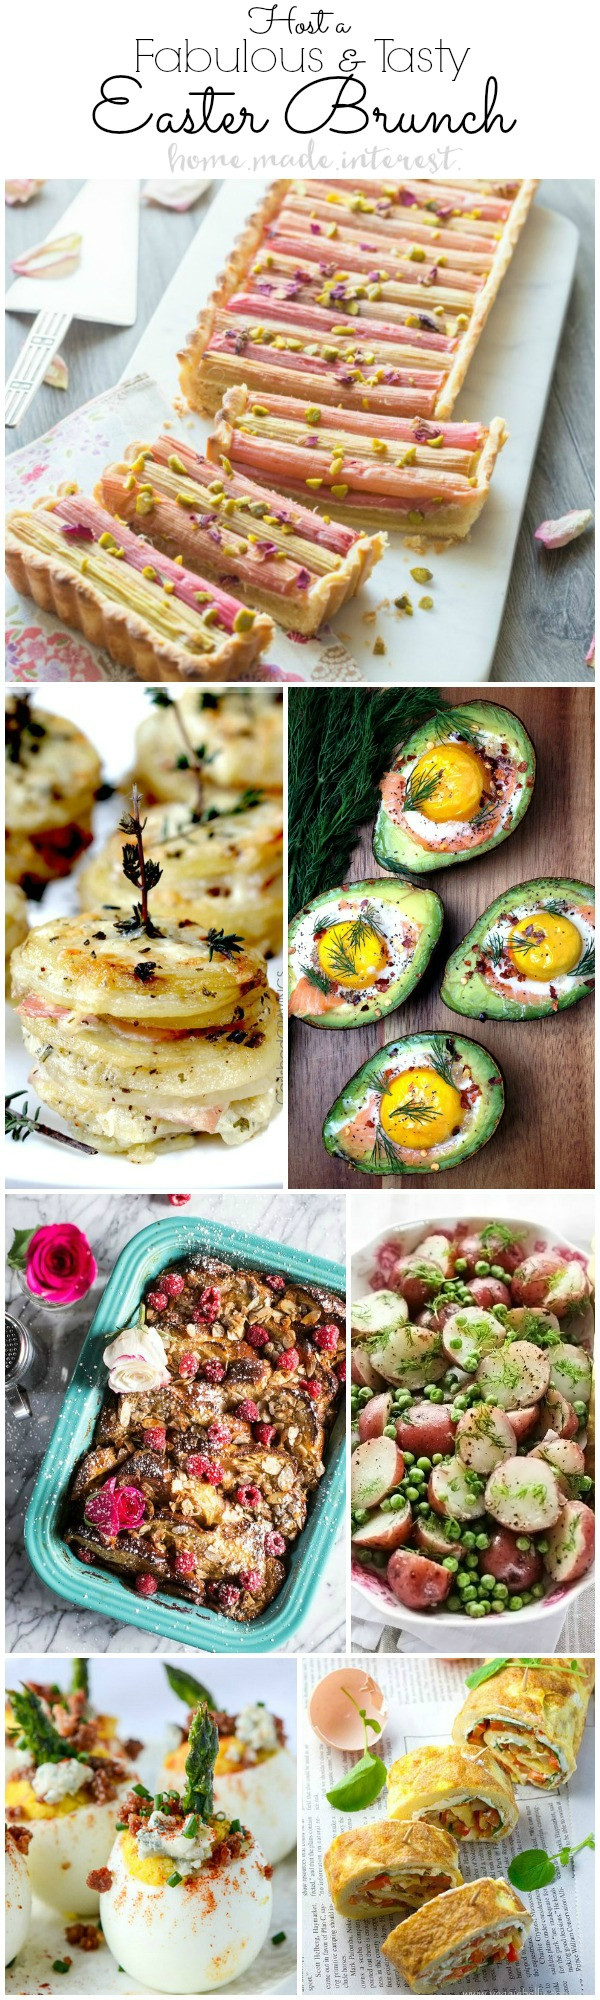 Make Ahead Easter Dinner 20 Of the Best Ideas for Hosting Easter Brunch Make Ahead Brunch Dishes